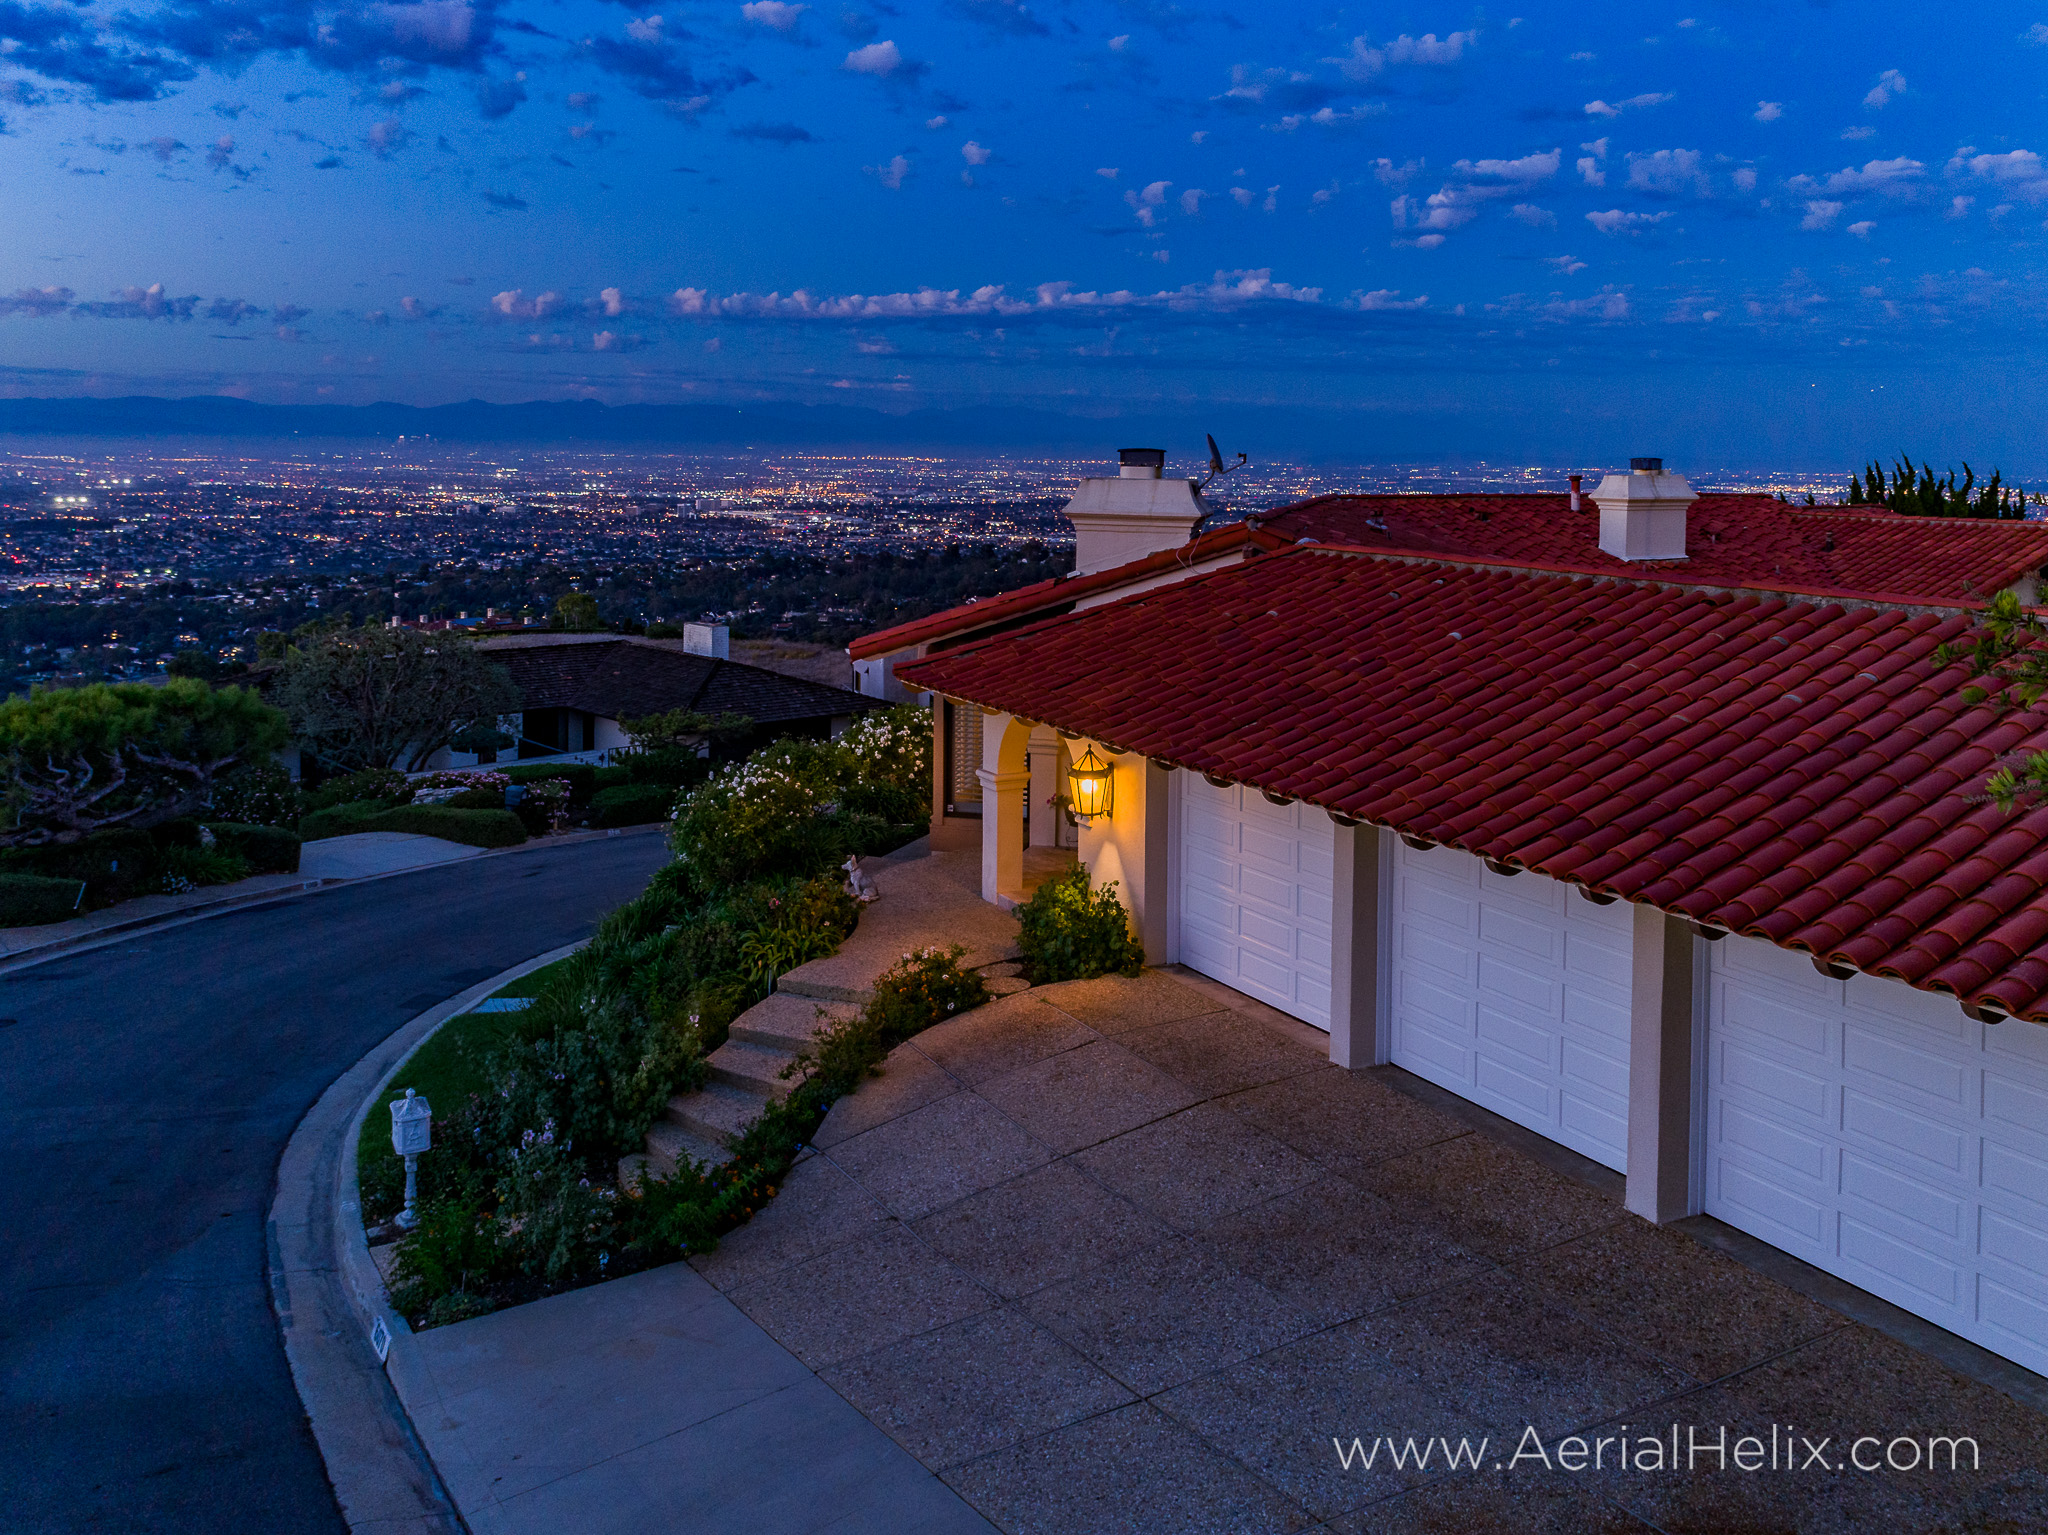 Woodfern Drive - HELIX Real Estate Aerial Photographer-34.jpg